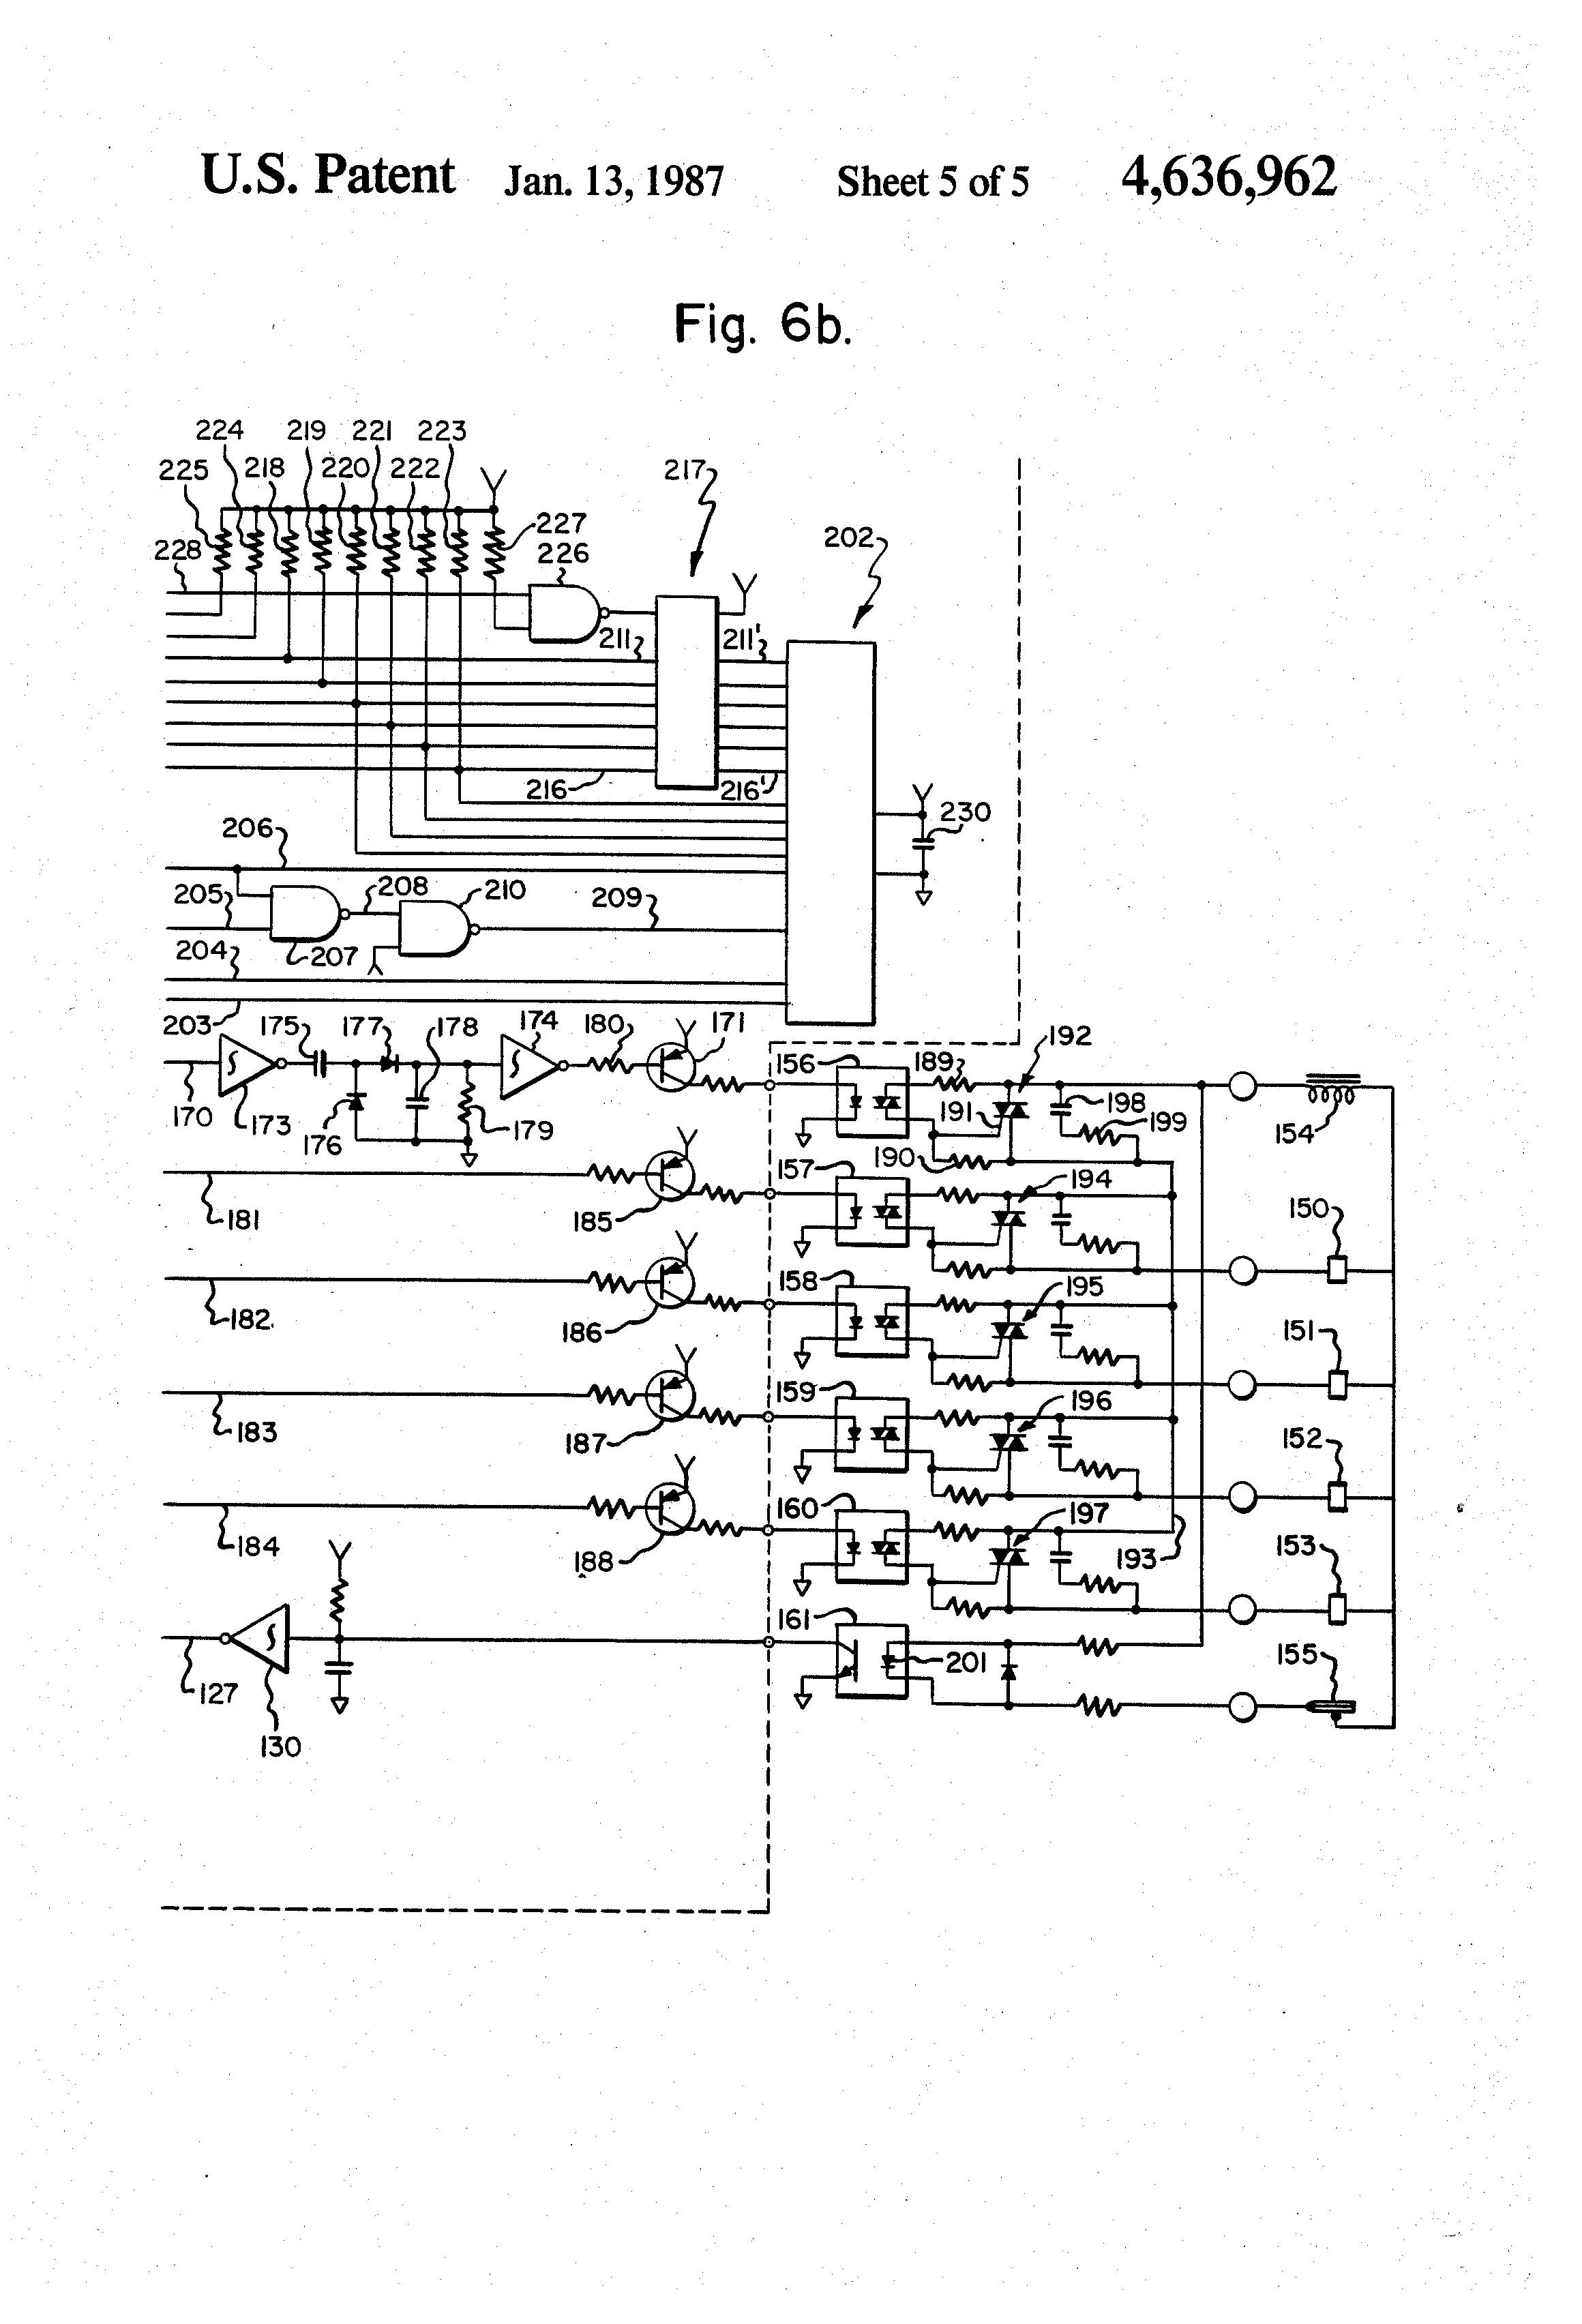 Crane Xr700 Wiring Diagram Crane Wiring Harness Engine Wiring Harness Wiring Diagrams Of Crane Xr700 Wiring Diagram